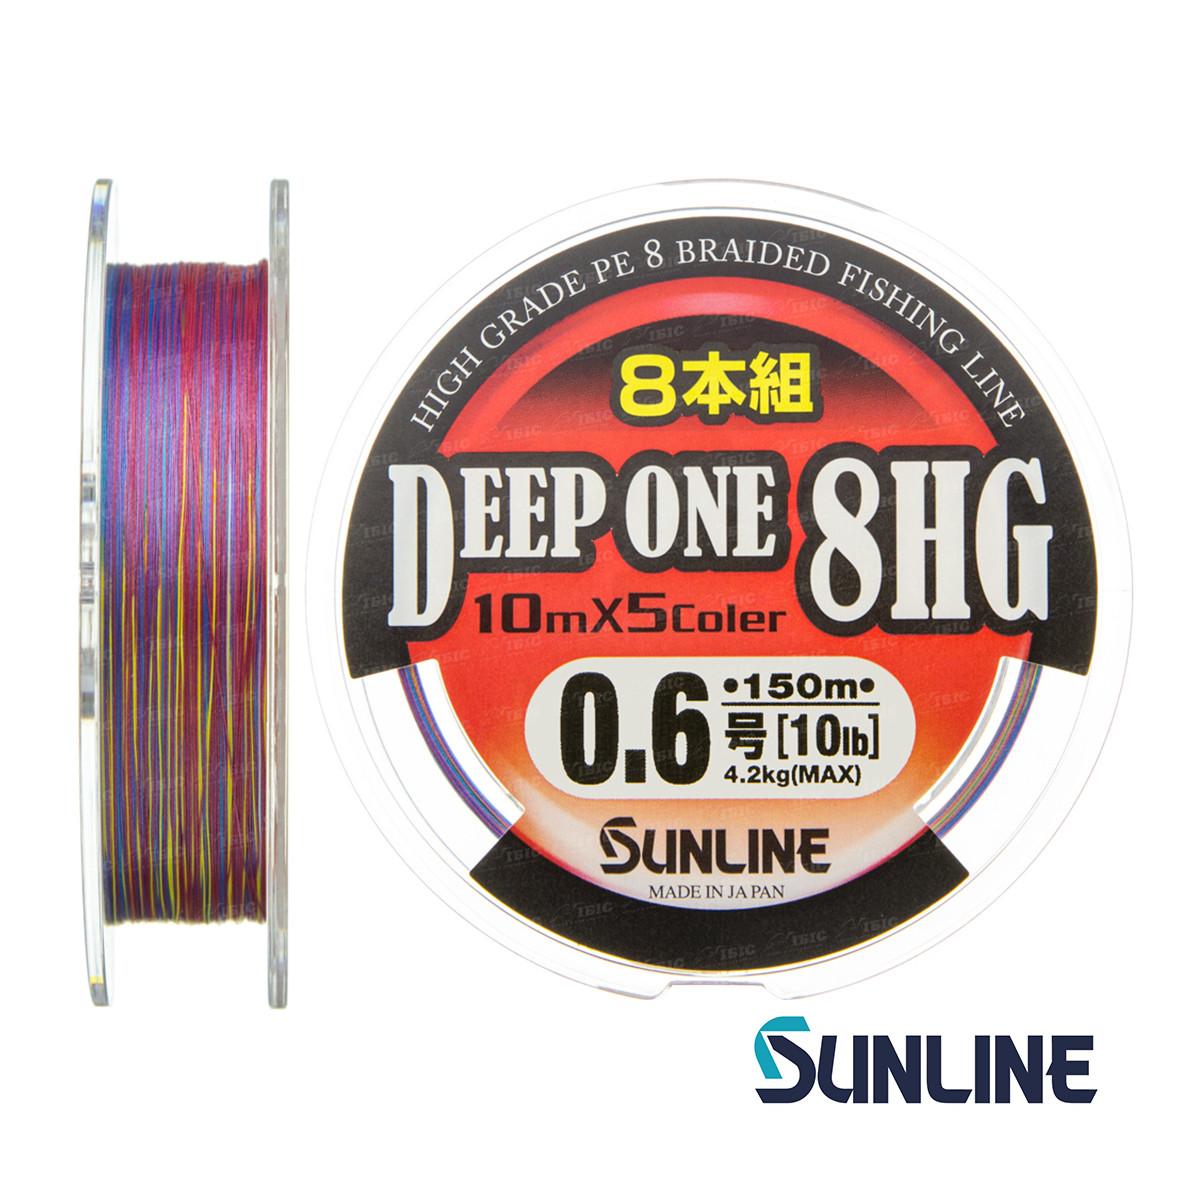 Шнур Sunline Deep One 8HG 200m #0.8/0.153мм 5.6кг